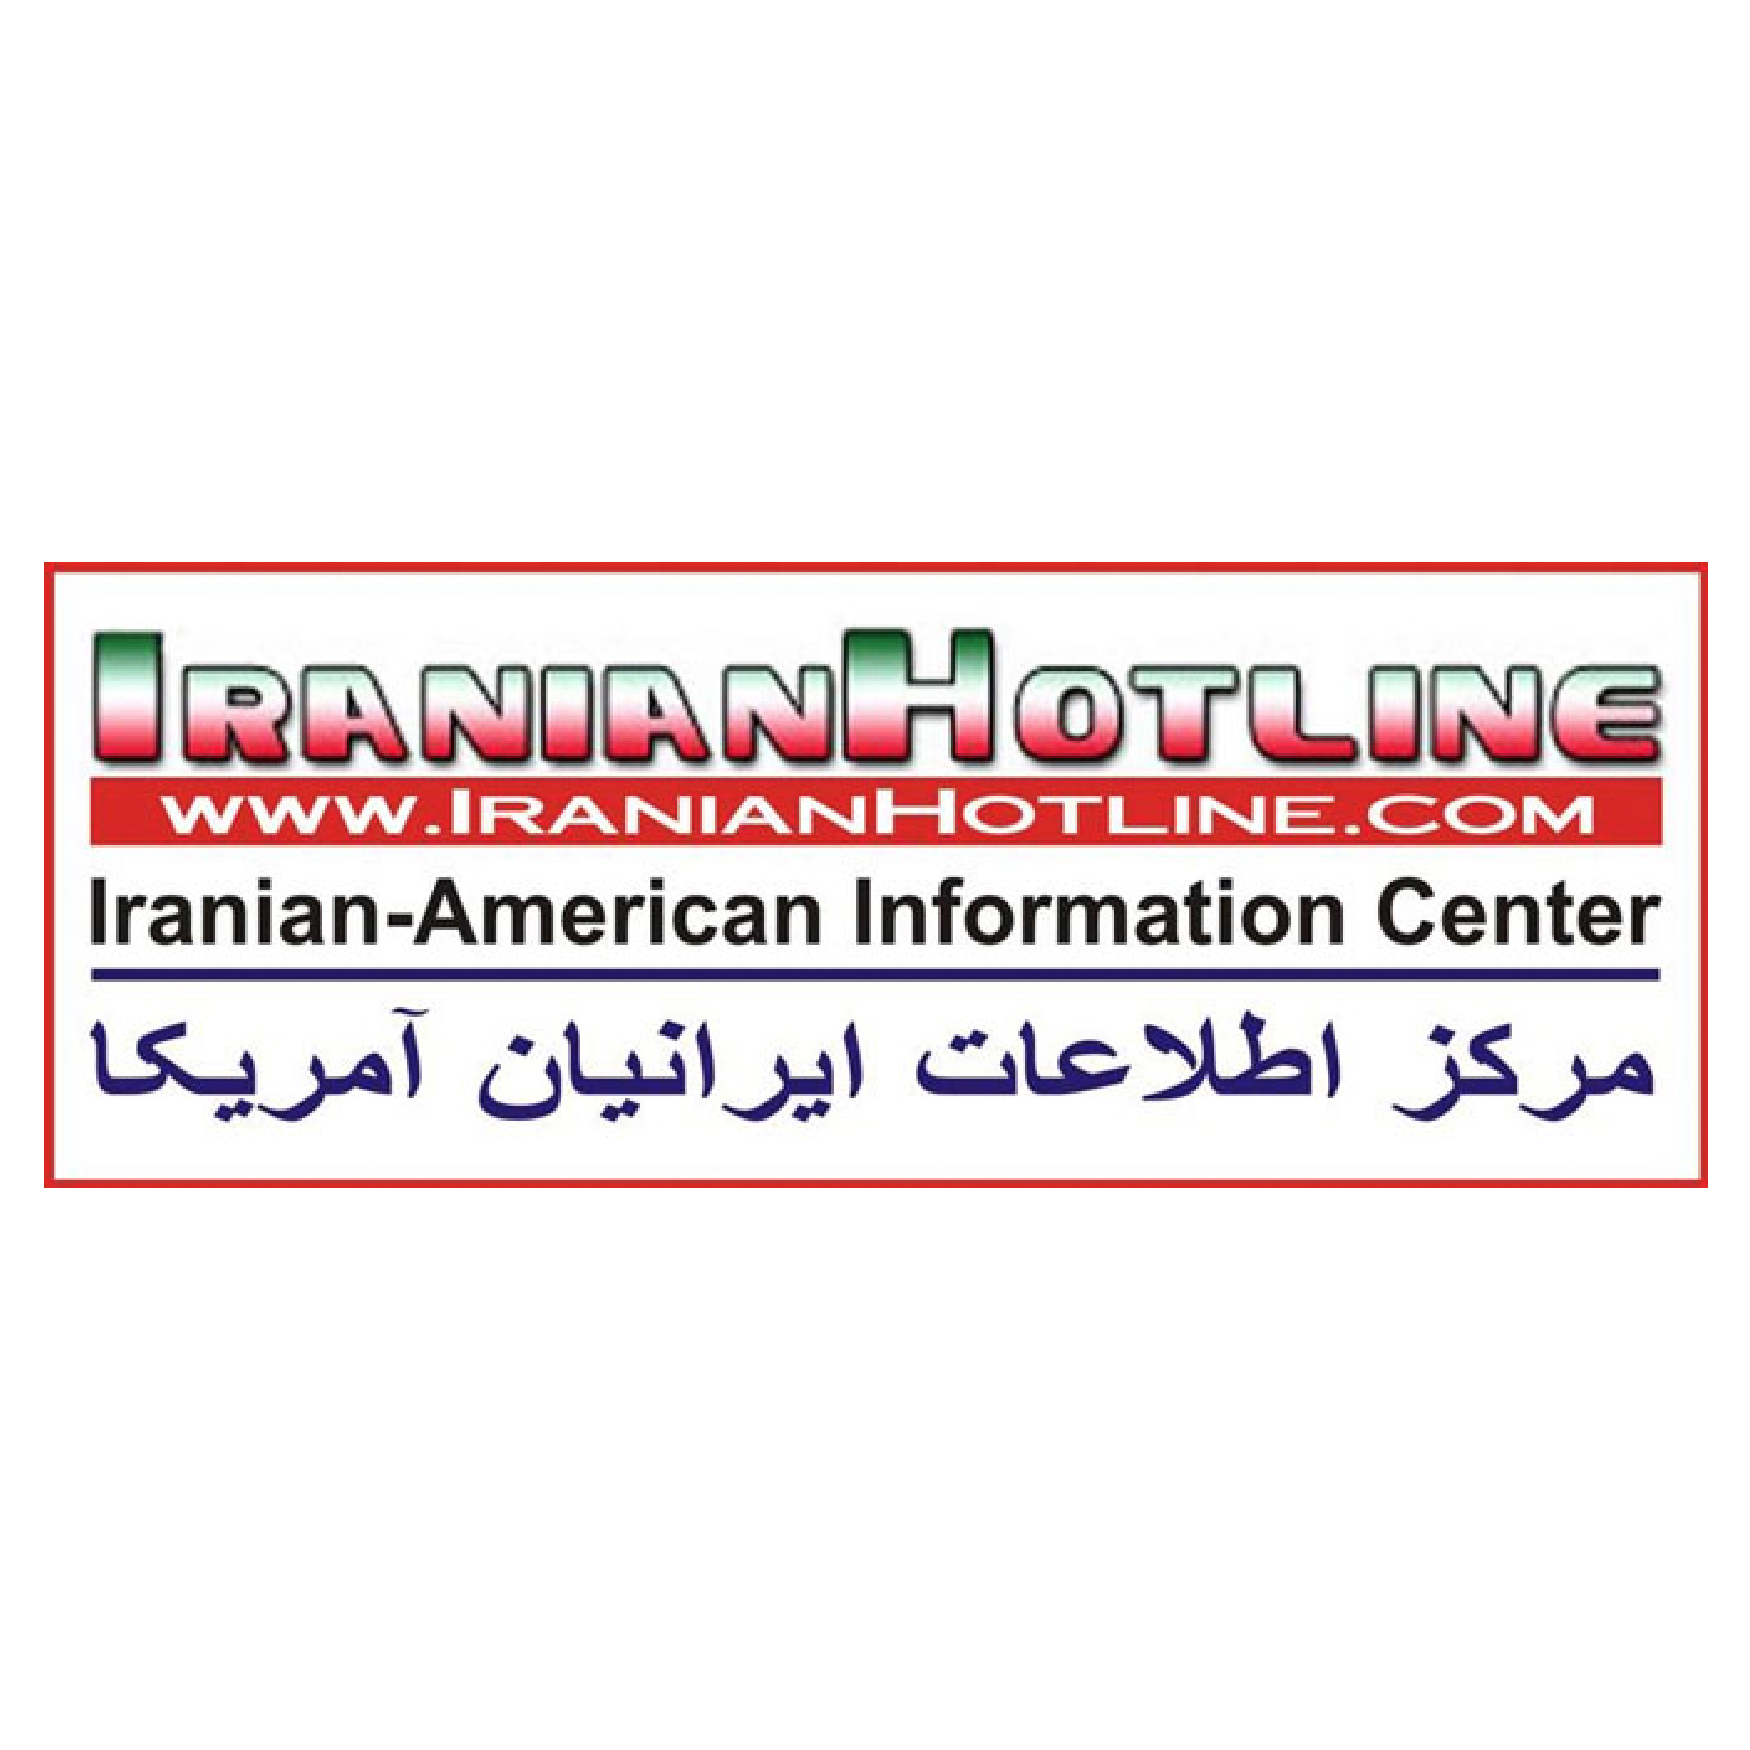 Iranian Hotline